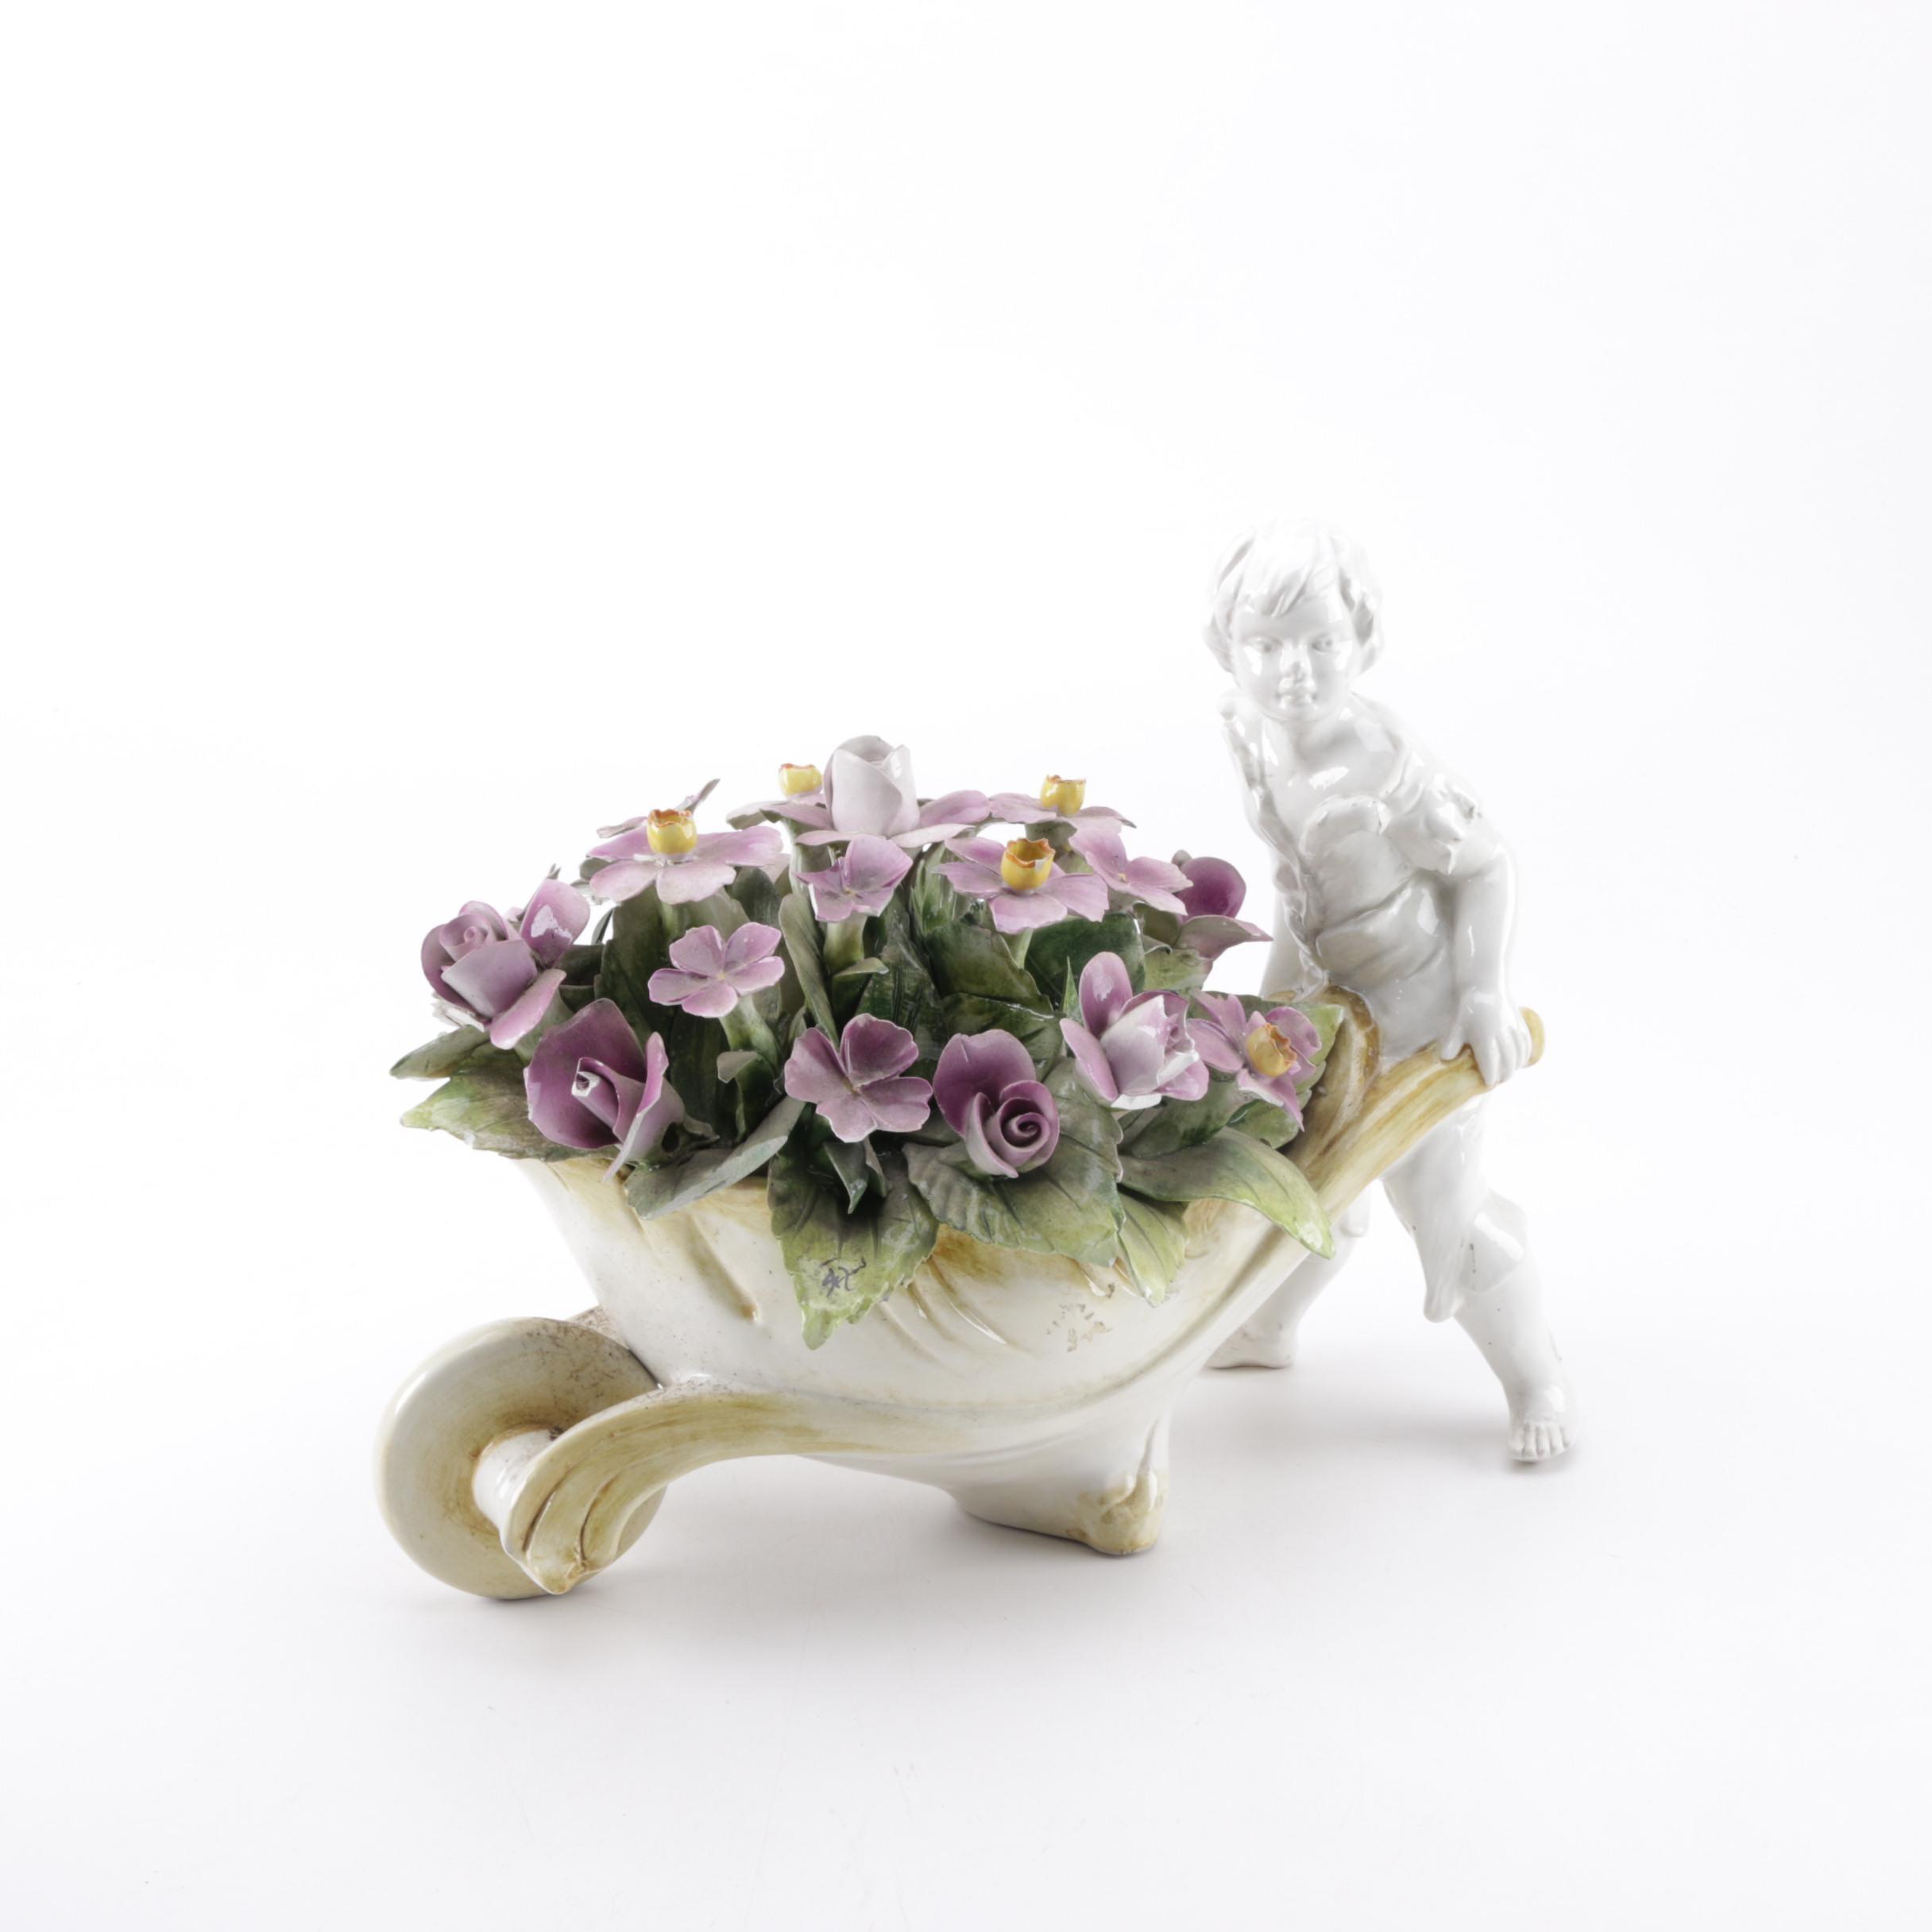 Ceramic Figurine with Wheelbarrow of Flowers